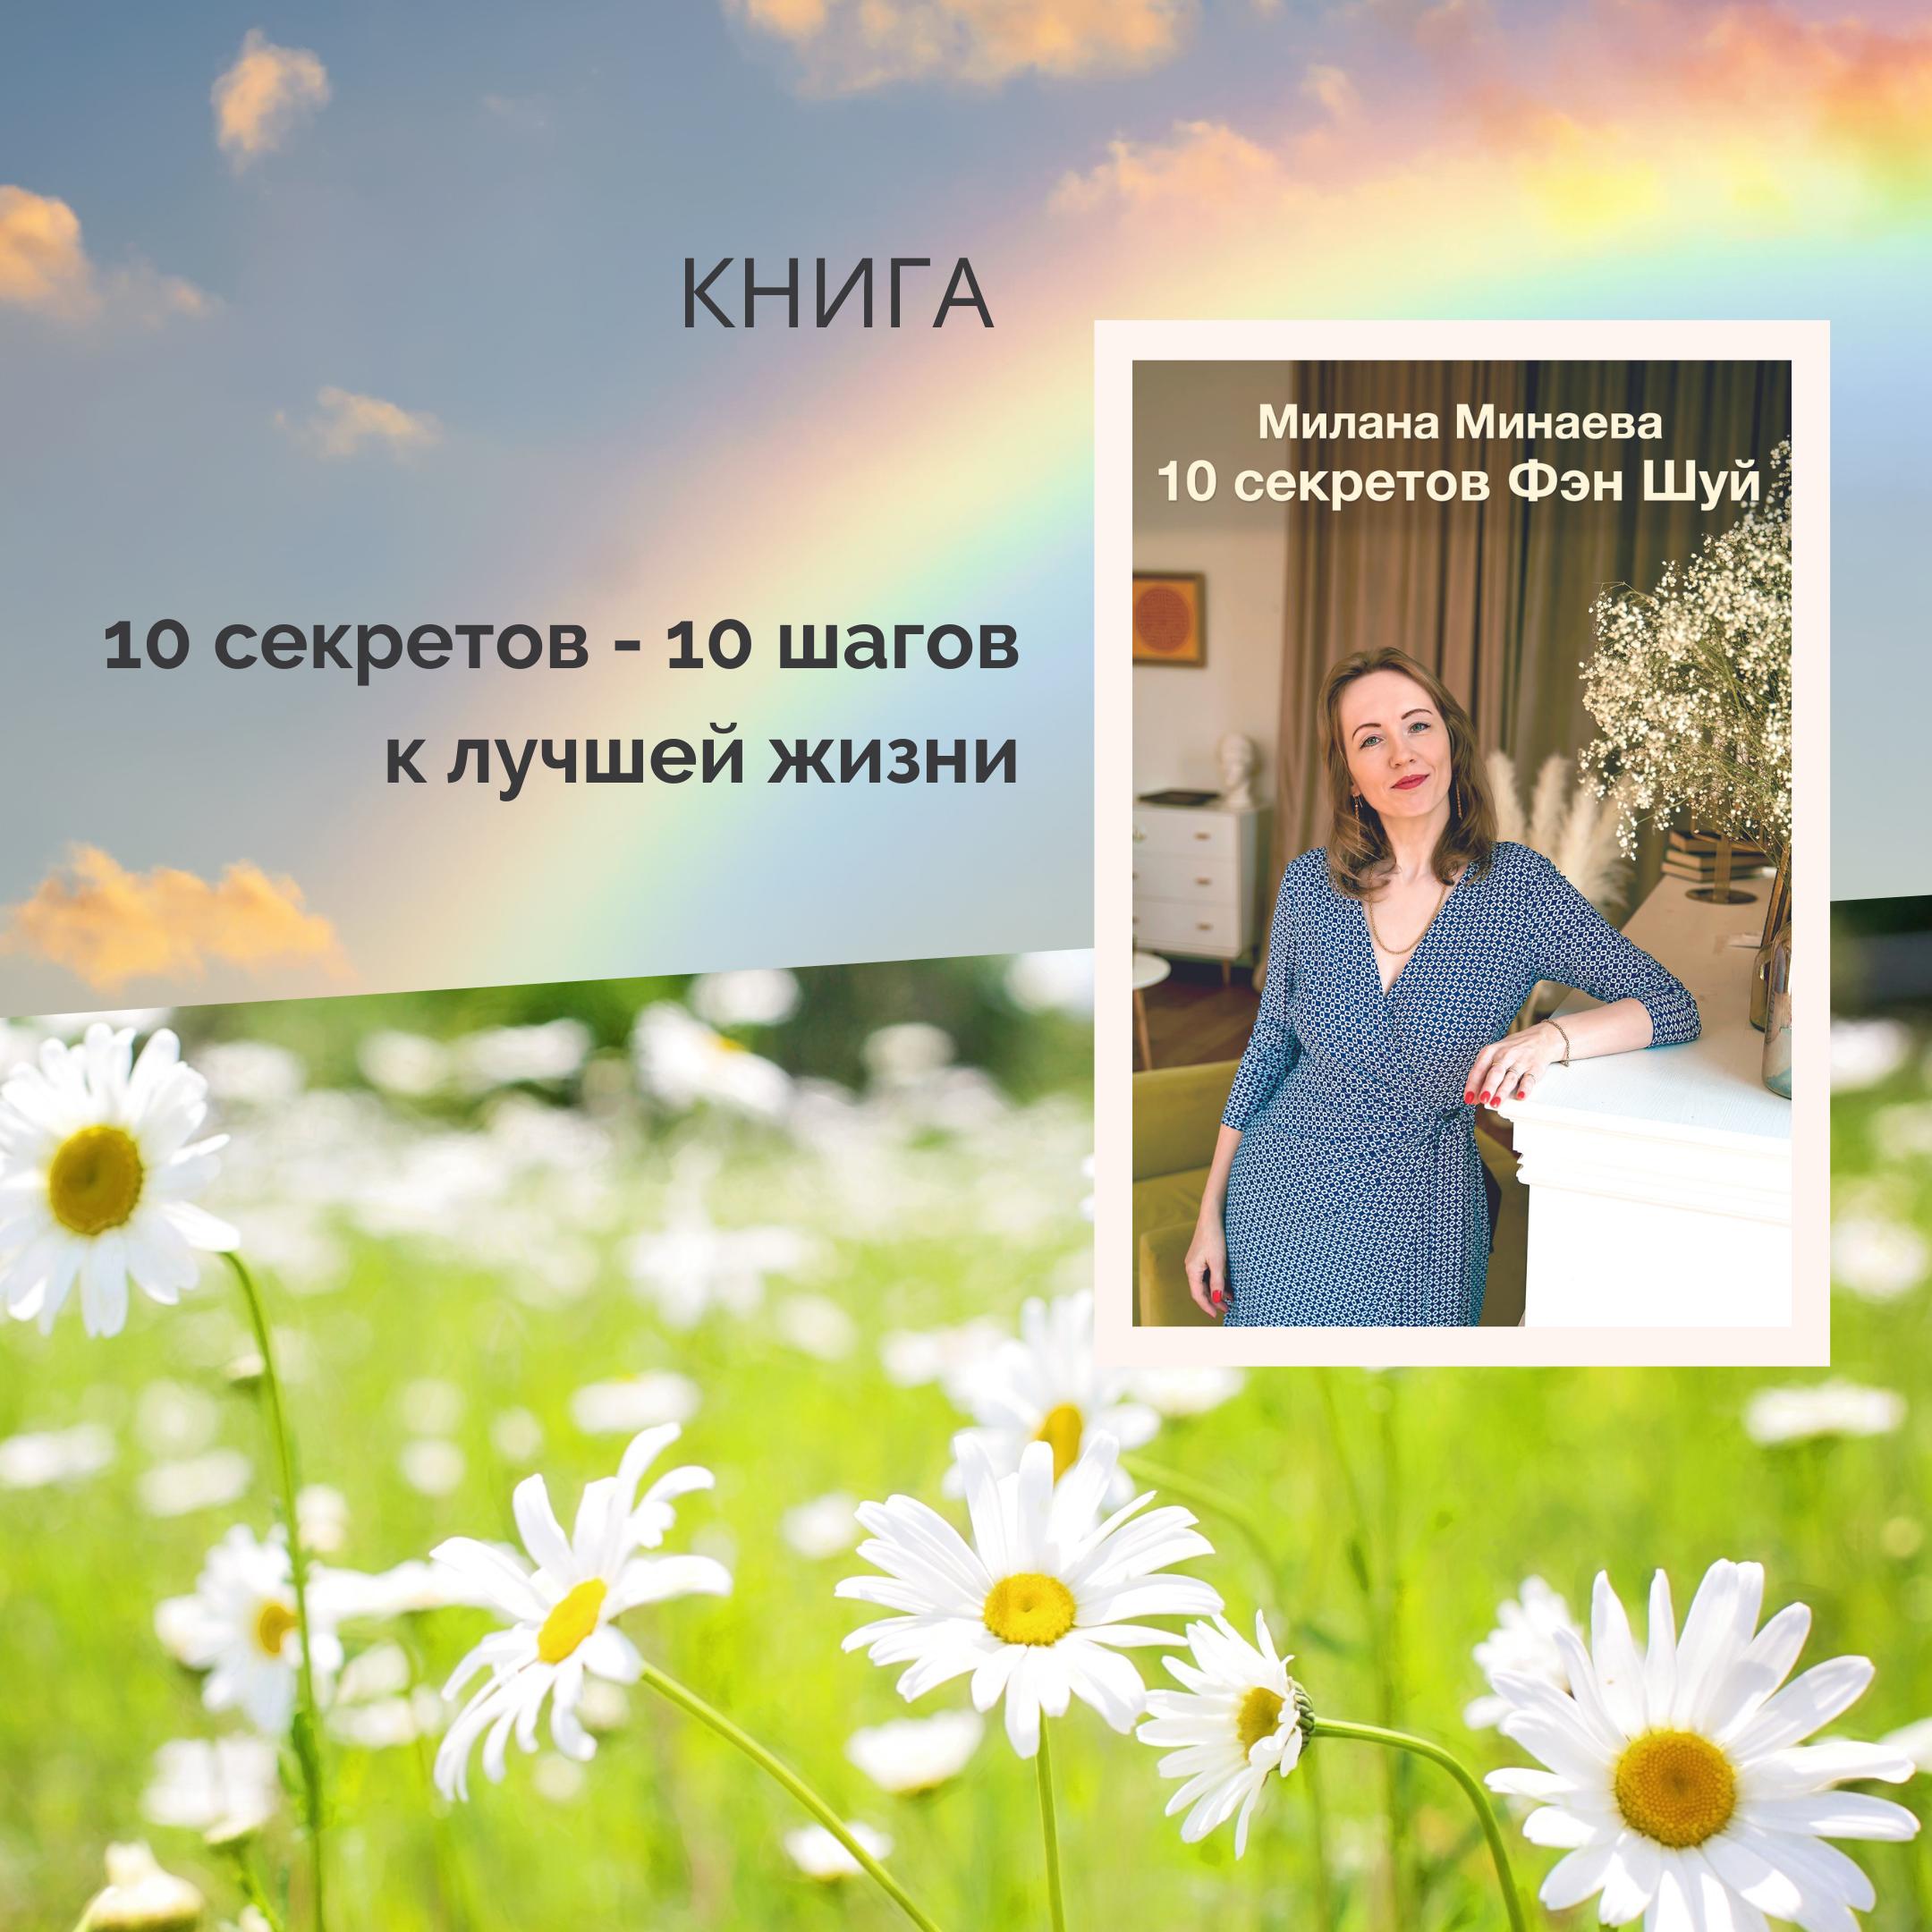 10 секретов Фэн Шуй • Milana.Ru